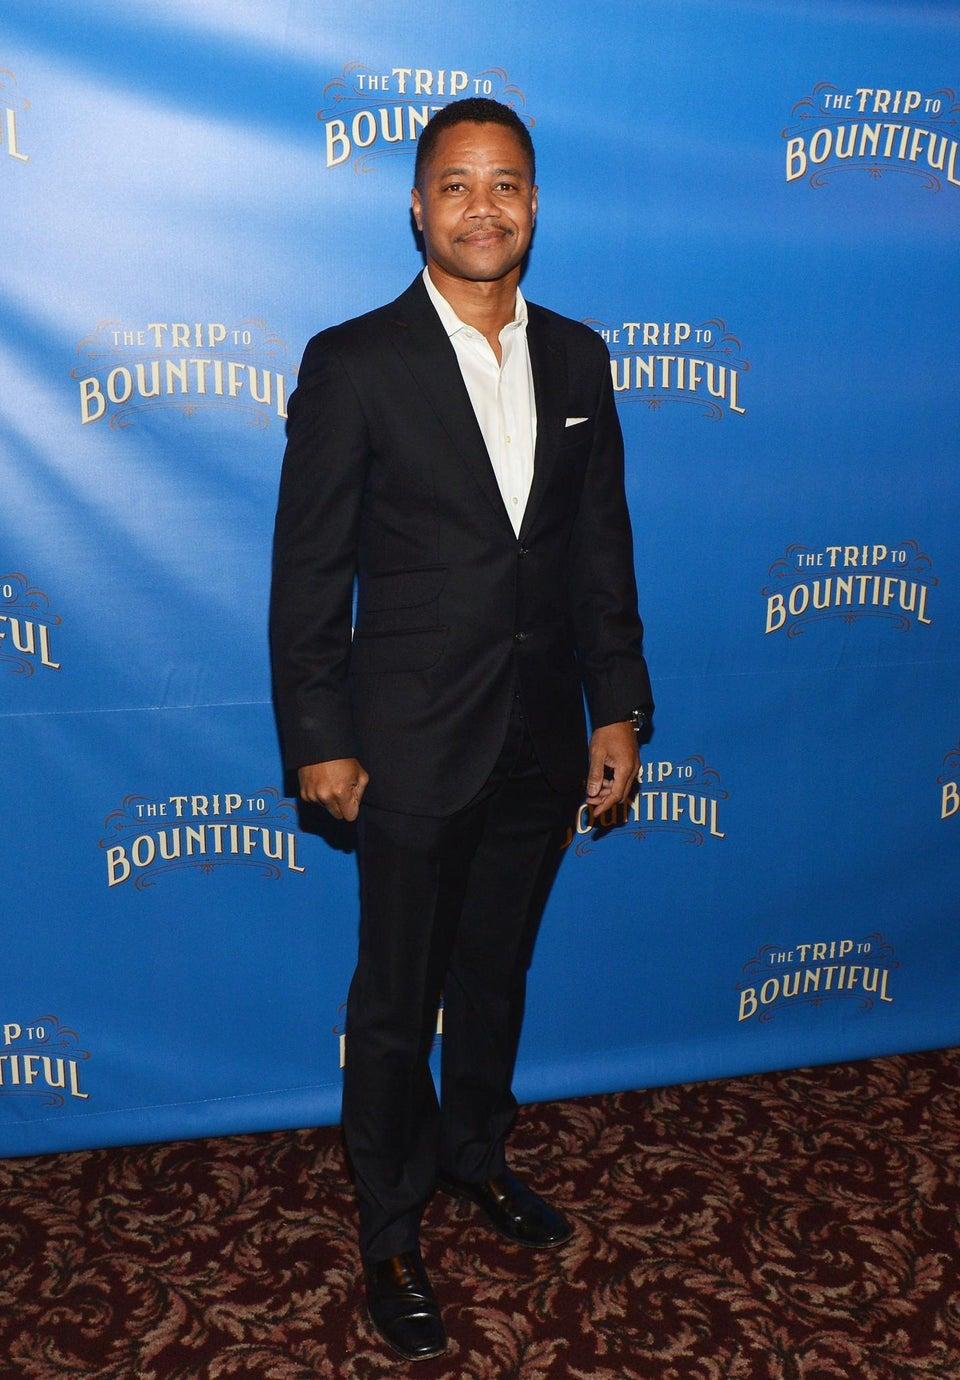 Cuba Gooding Jr. to Leave Broadway's 'Trip to Bountiful'